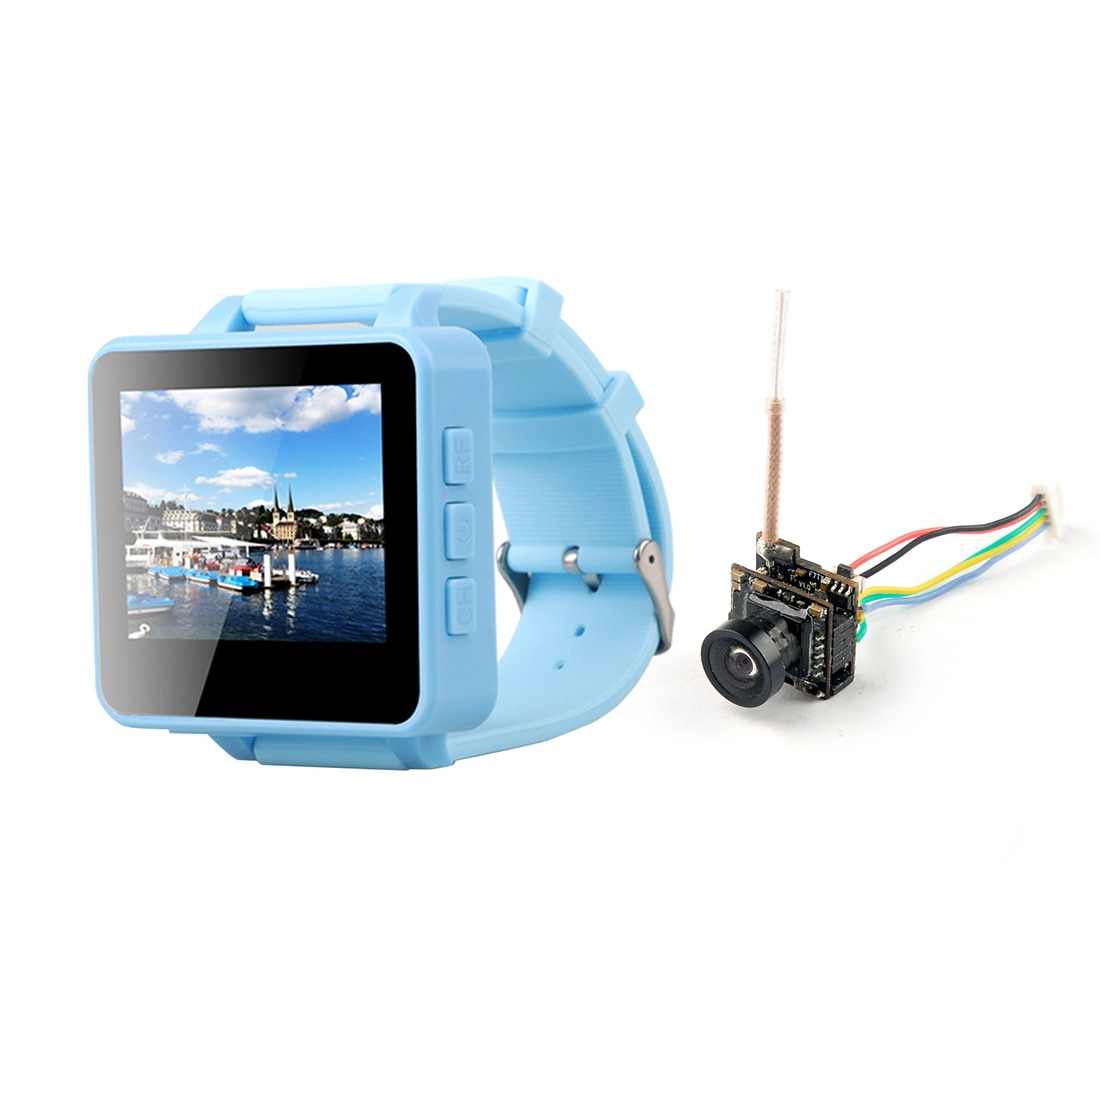 FPV ver FPV200 5,8 GHz 48CH OSD Raceband DVR 2 pulgadas LCD 960*240 pantalla FPV receptor con HCF7P AIO VTX 5,8G 700TVL Cámara